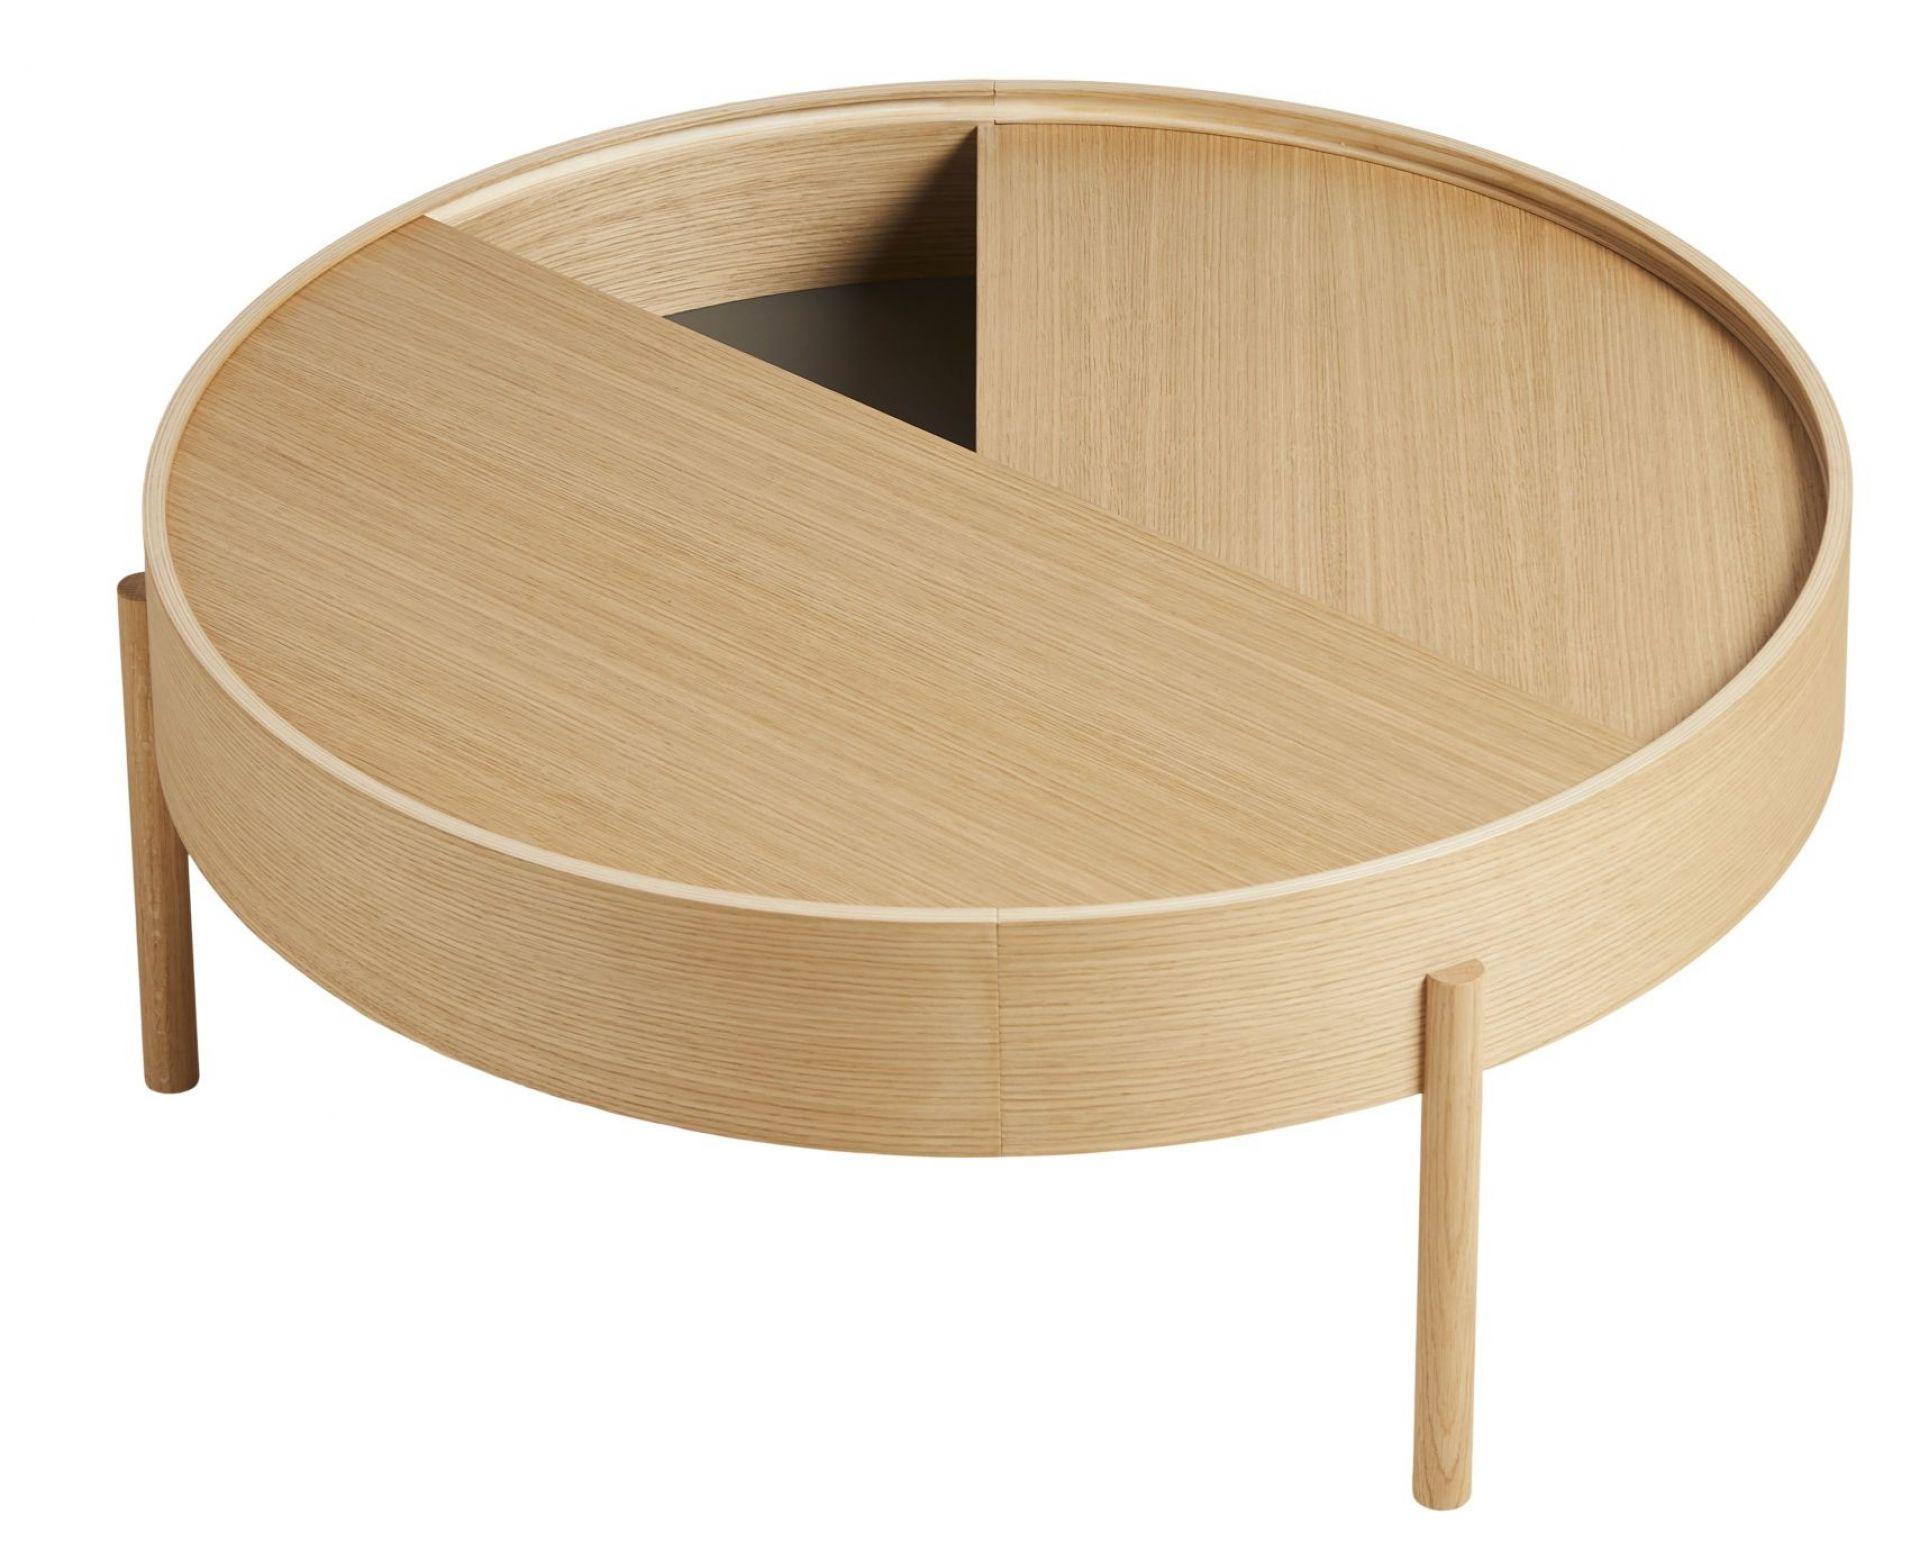 Arc Coffee Table ⌀ 89 cm Woud